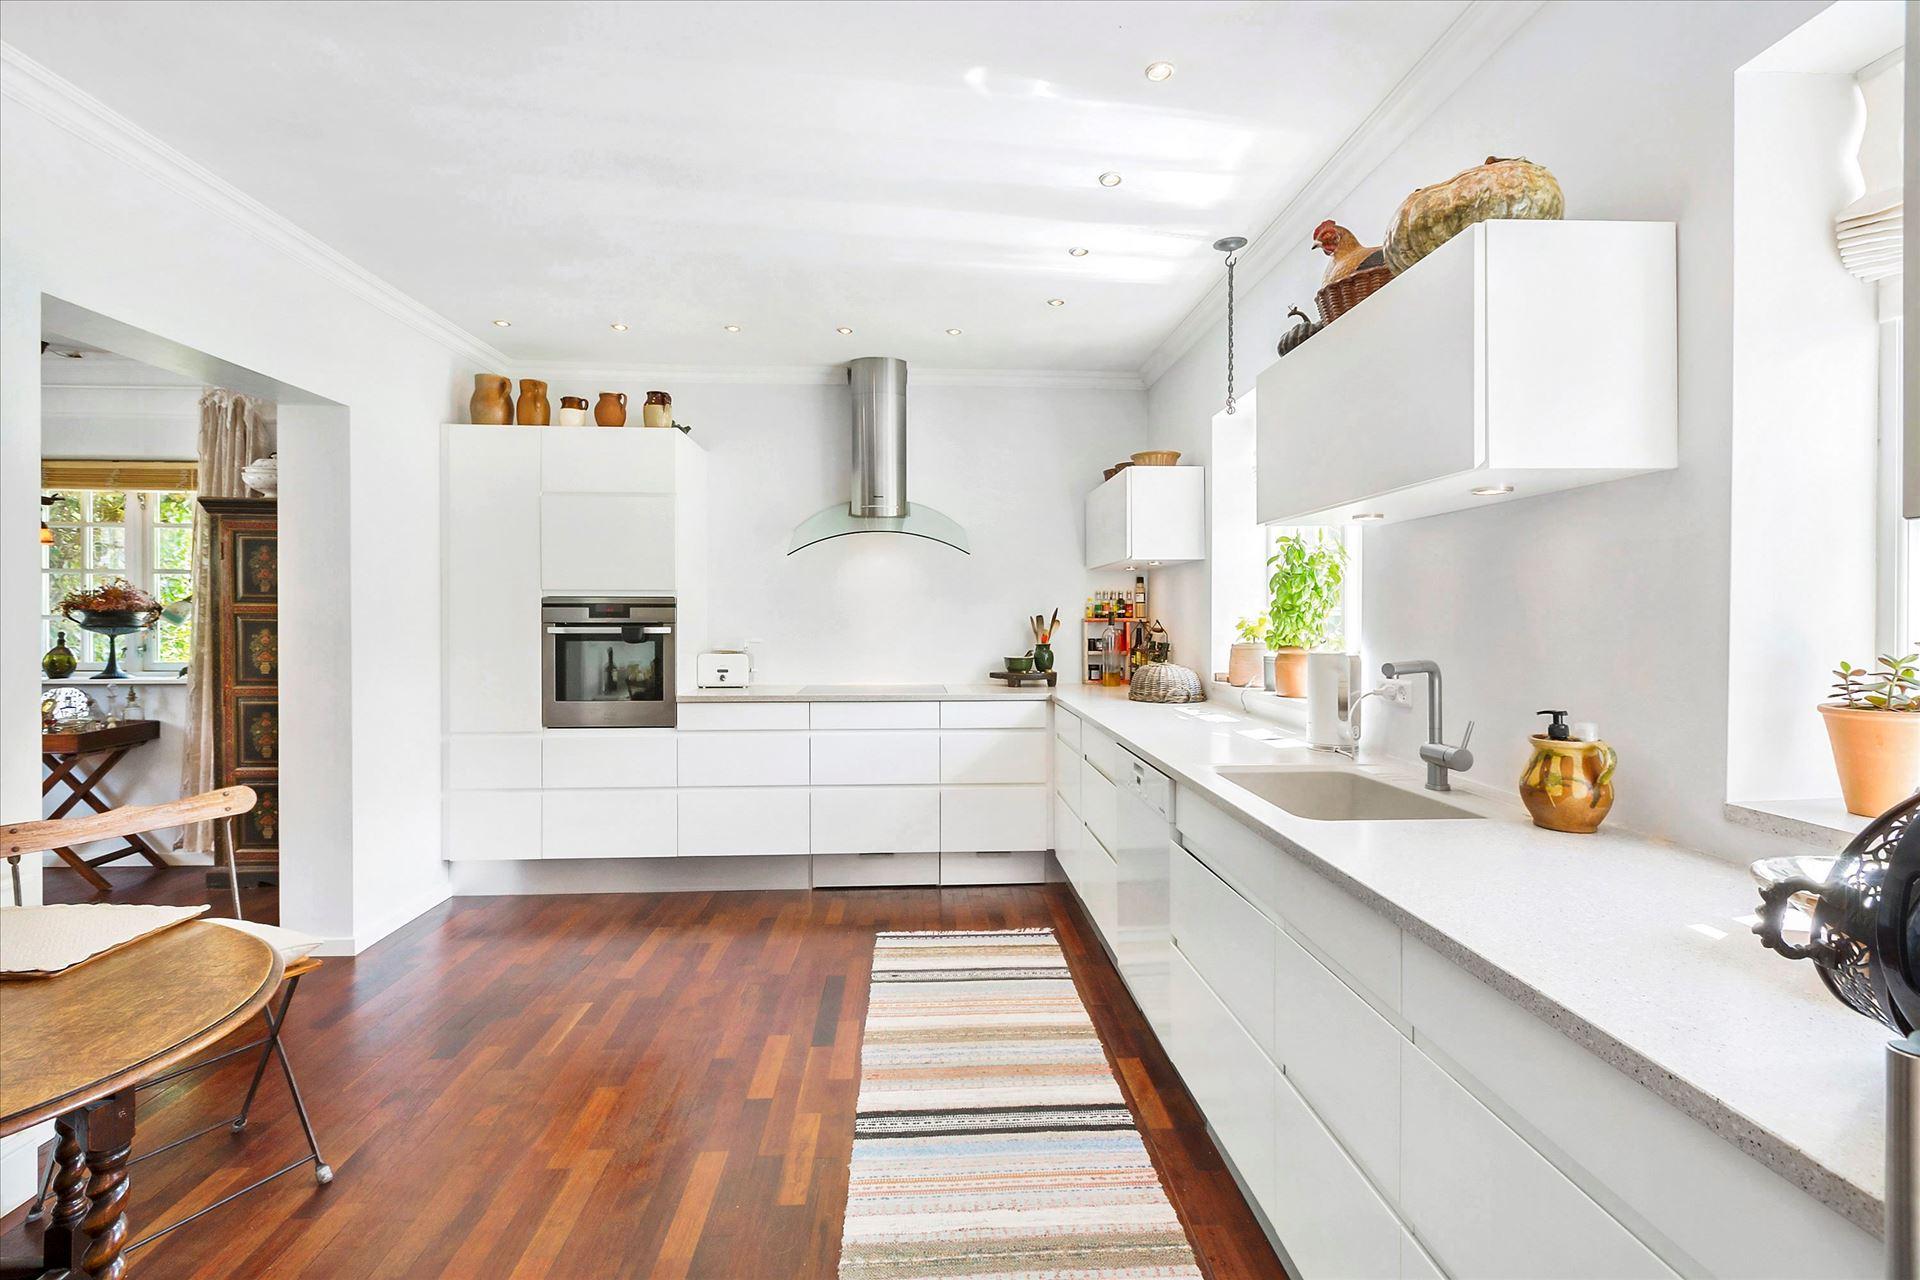 белая кухня шкаф вытяжка плита